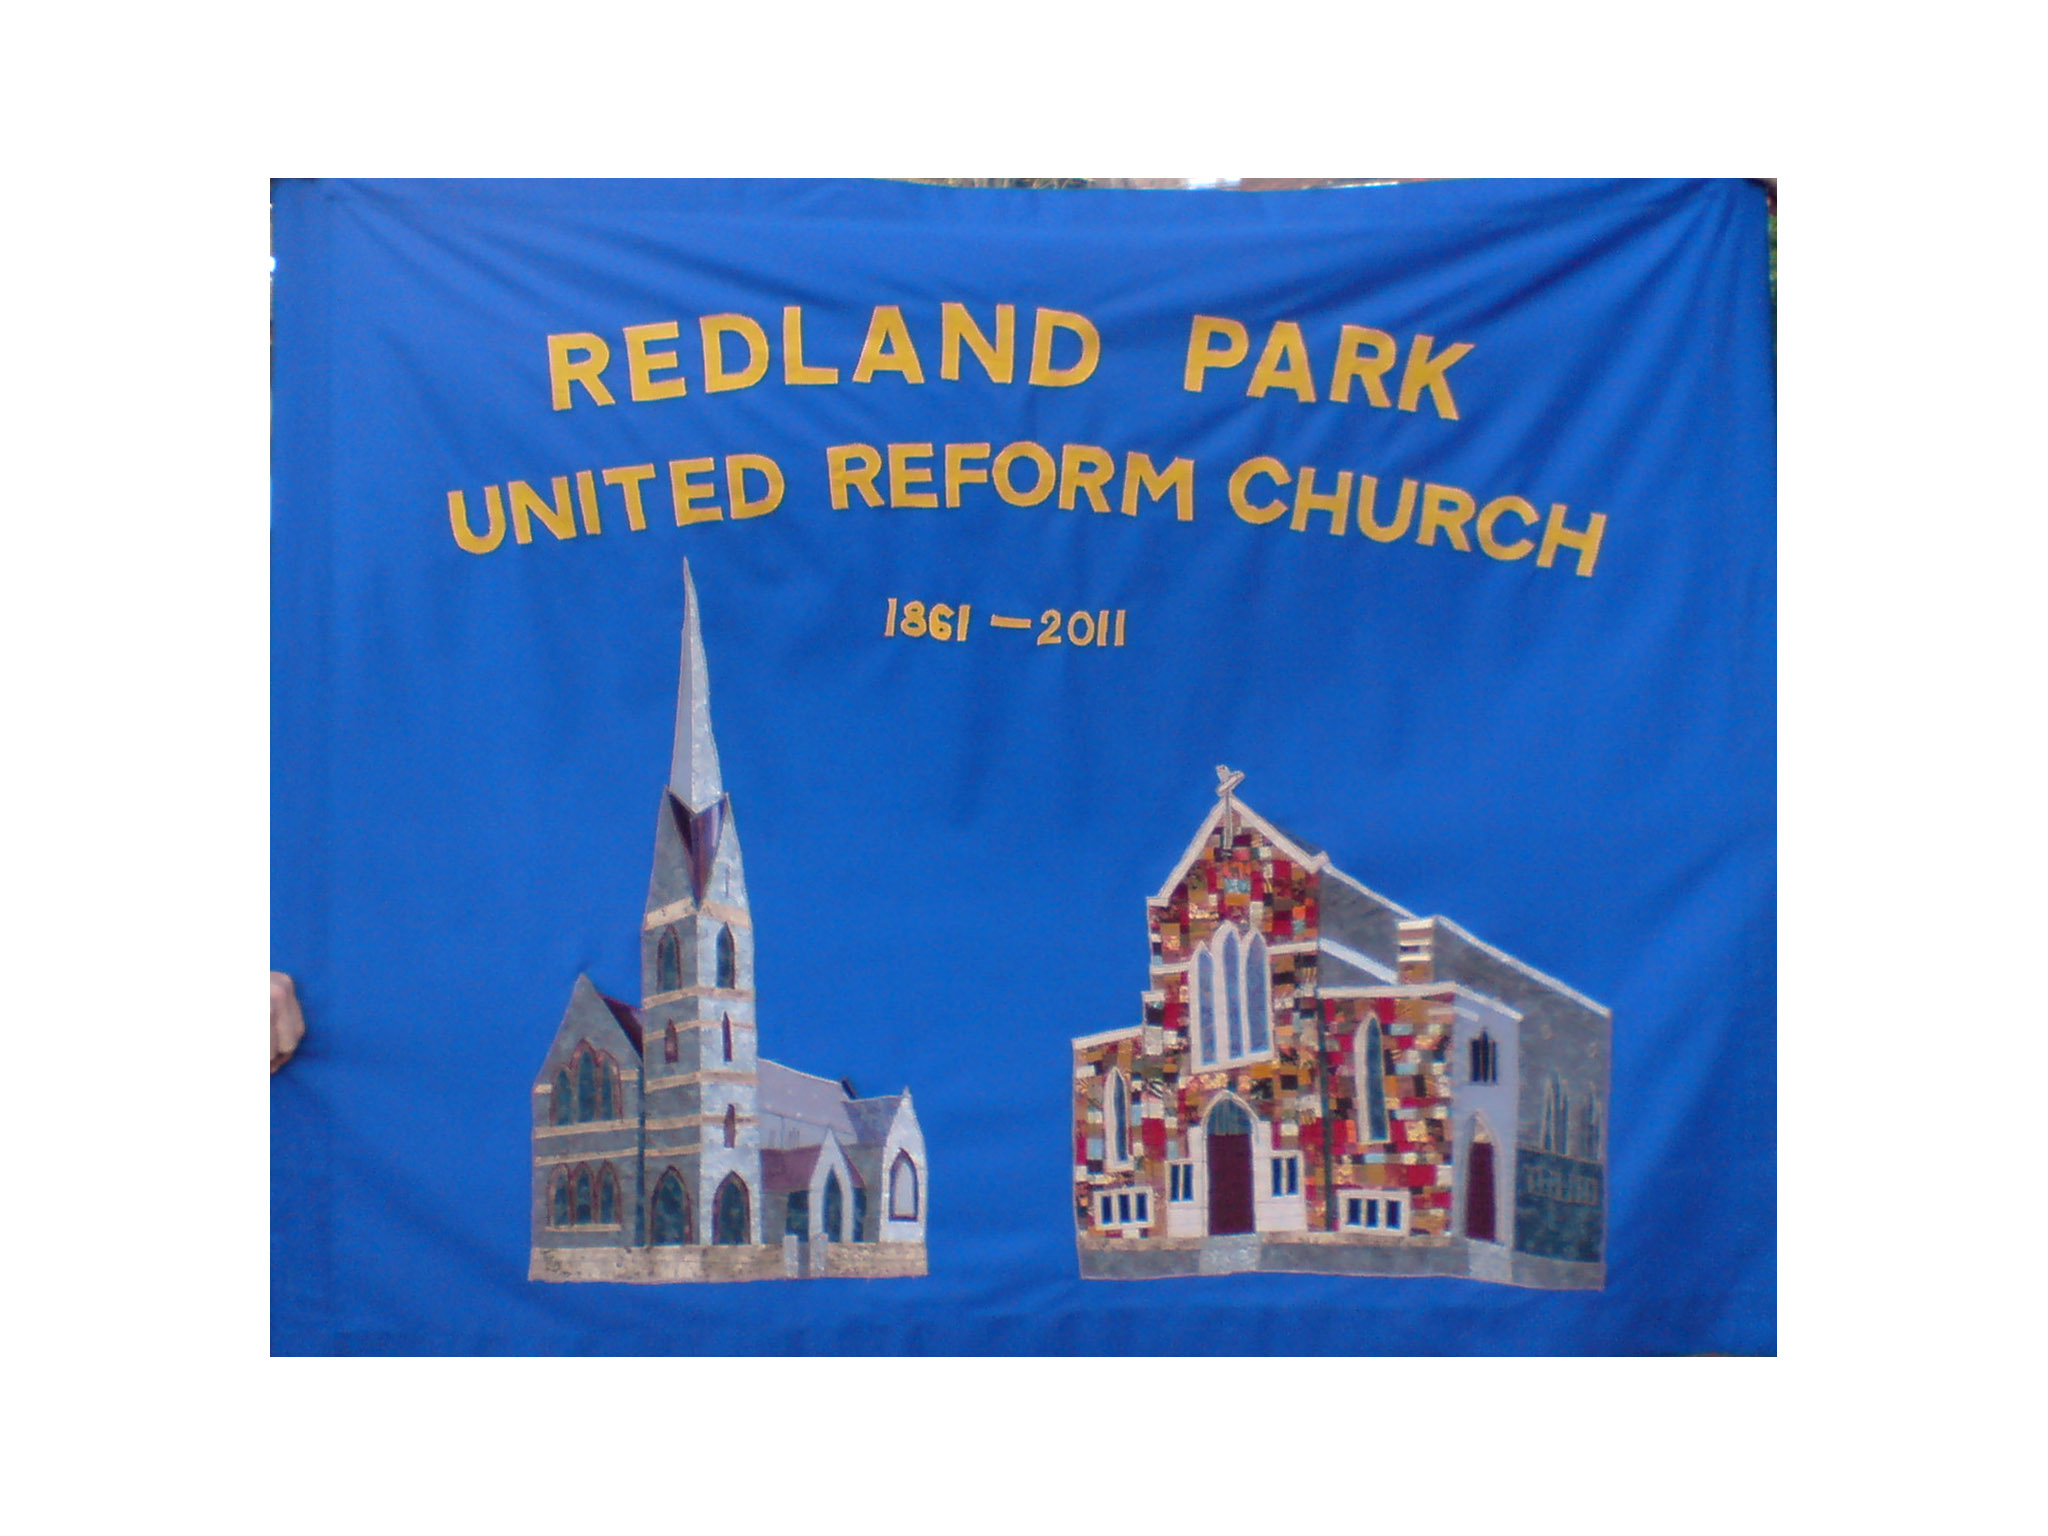 Carole A.'s church banner